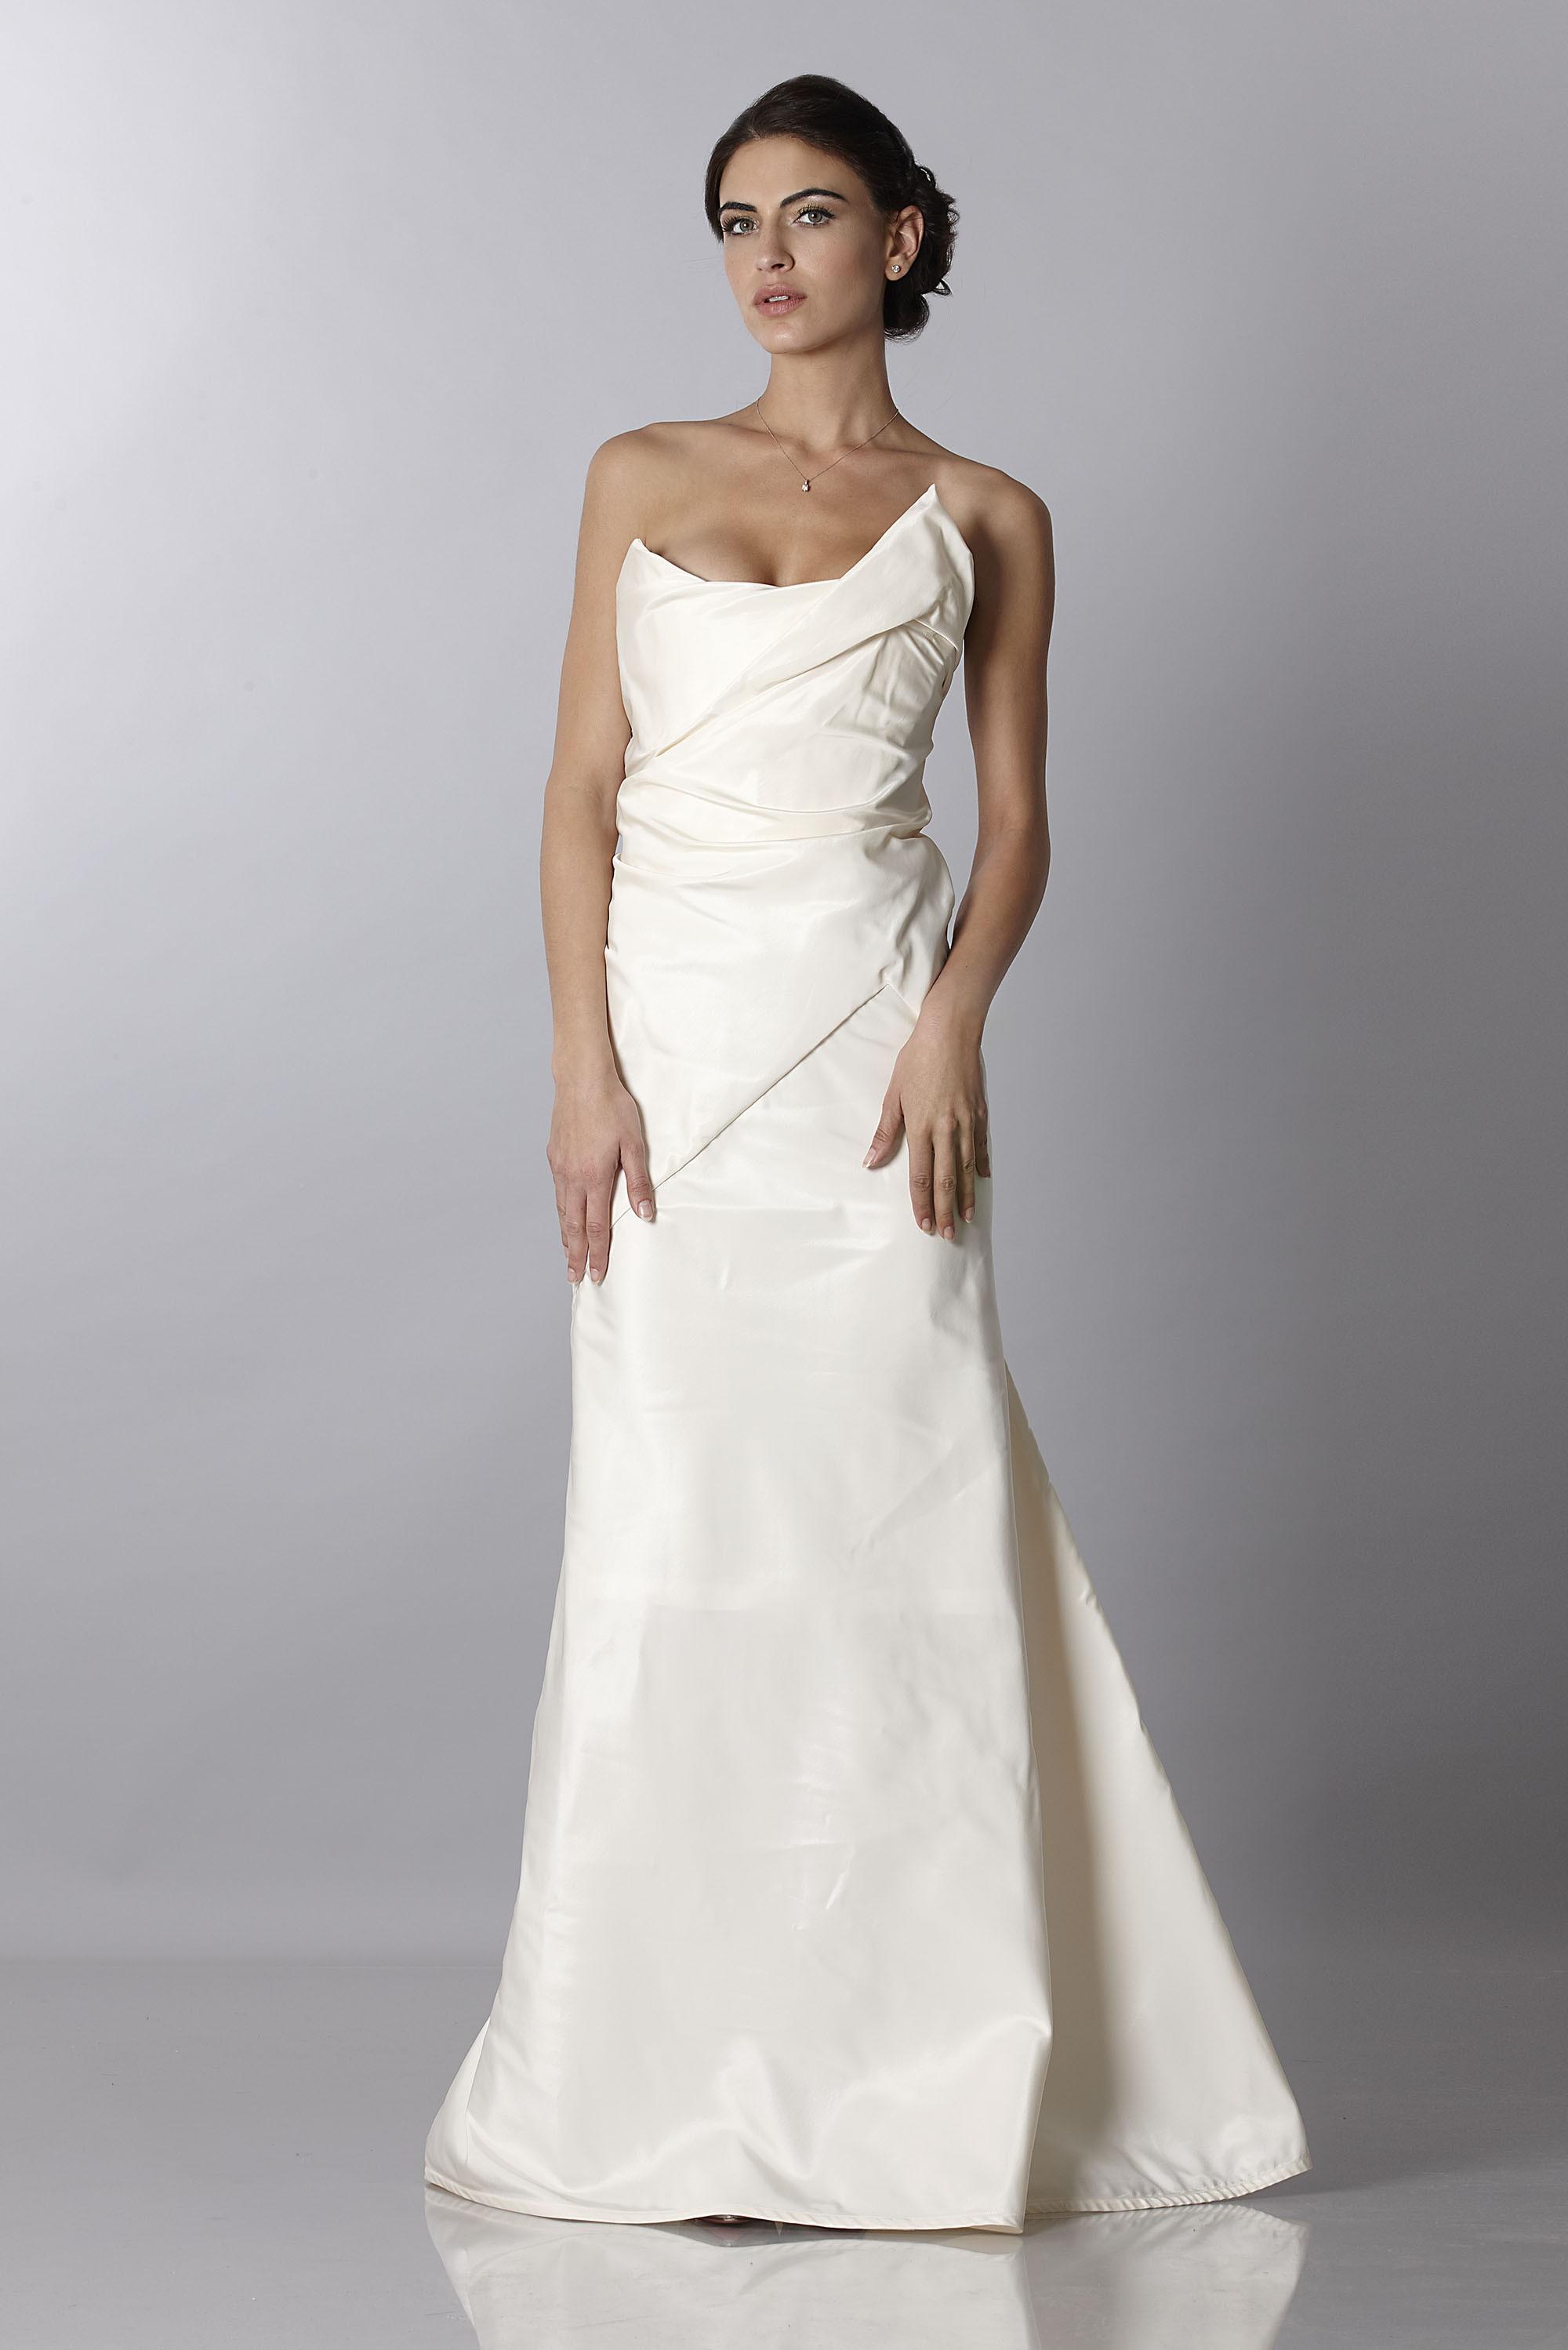 Viviene Westwood Wedding Dresses.Wedding Bustier Dress